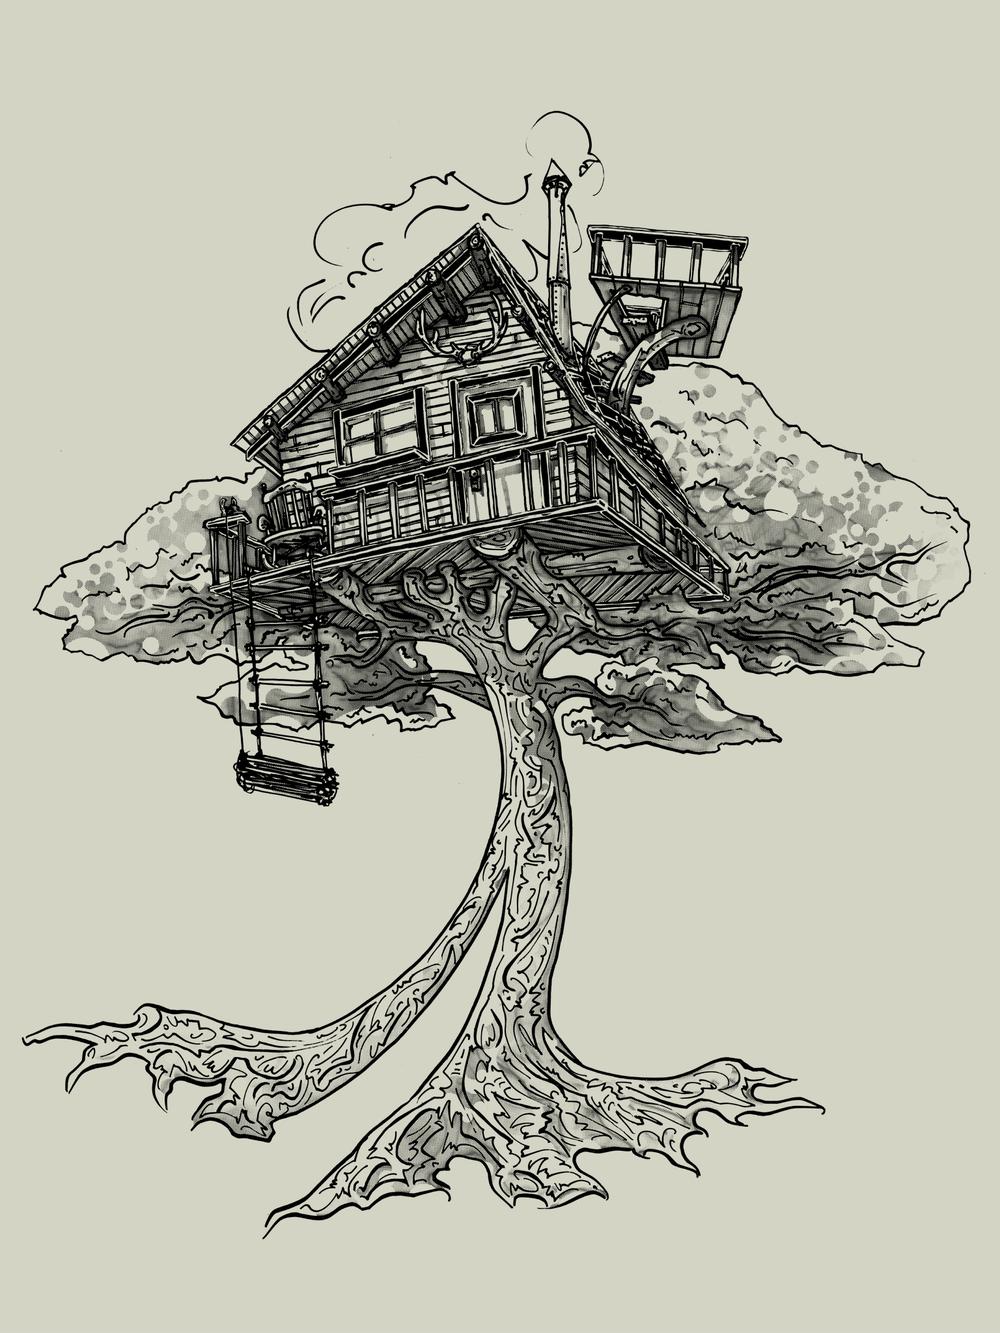 david_sheets_arbor_house.jpg